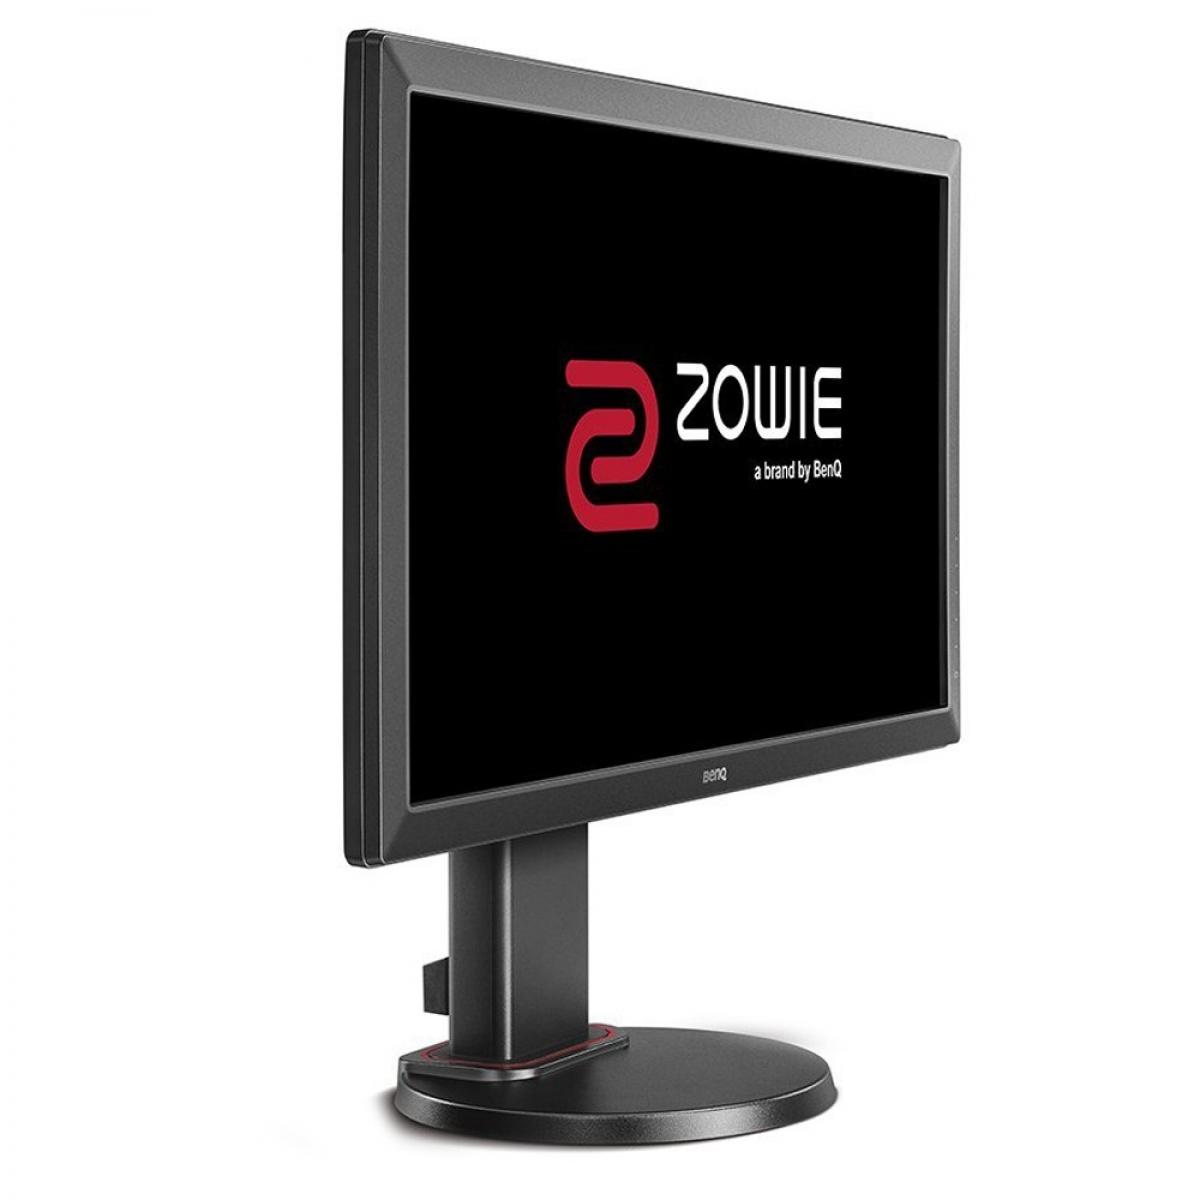 Monitor Benq Zowie 24 Pol, Full HD, 60Hz, 1ms, RL2460